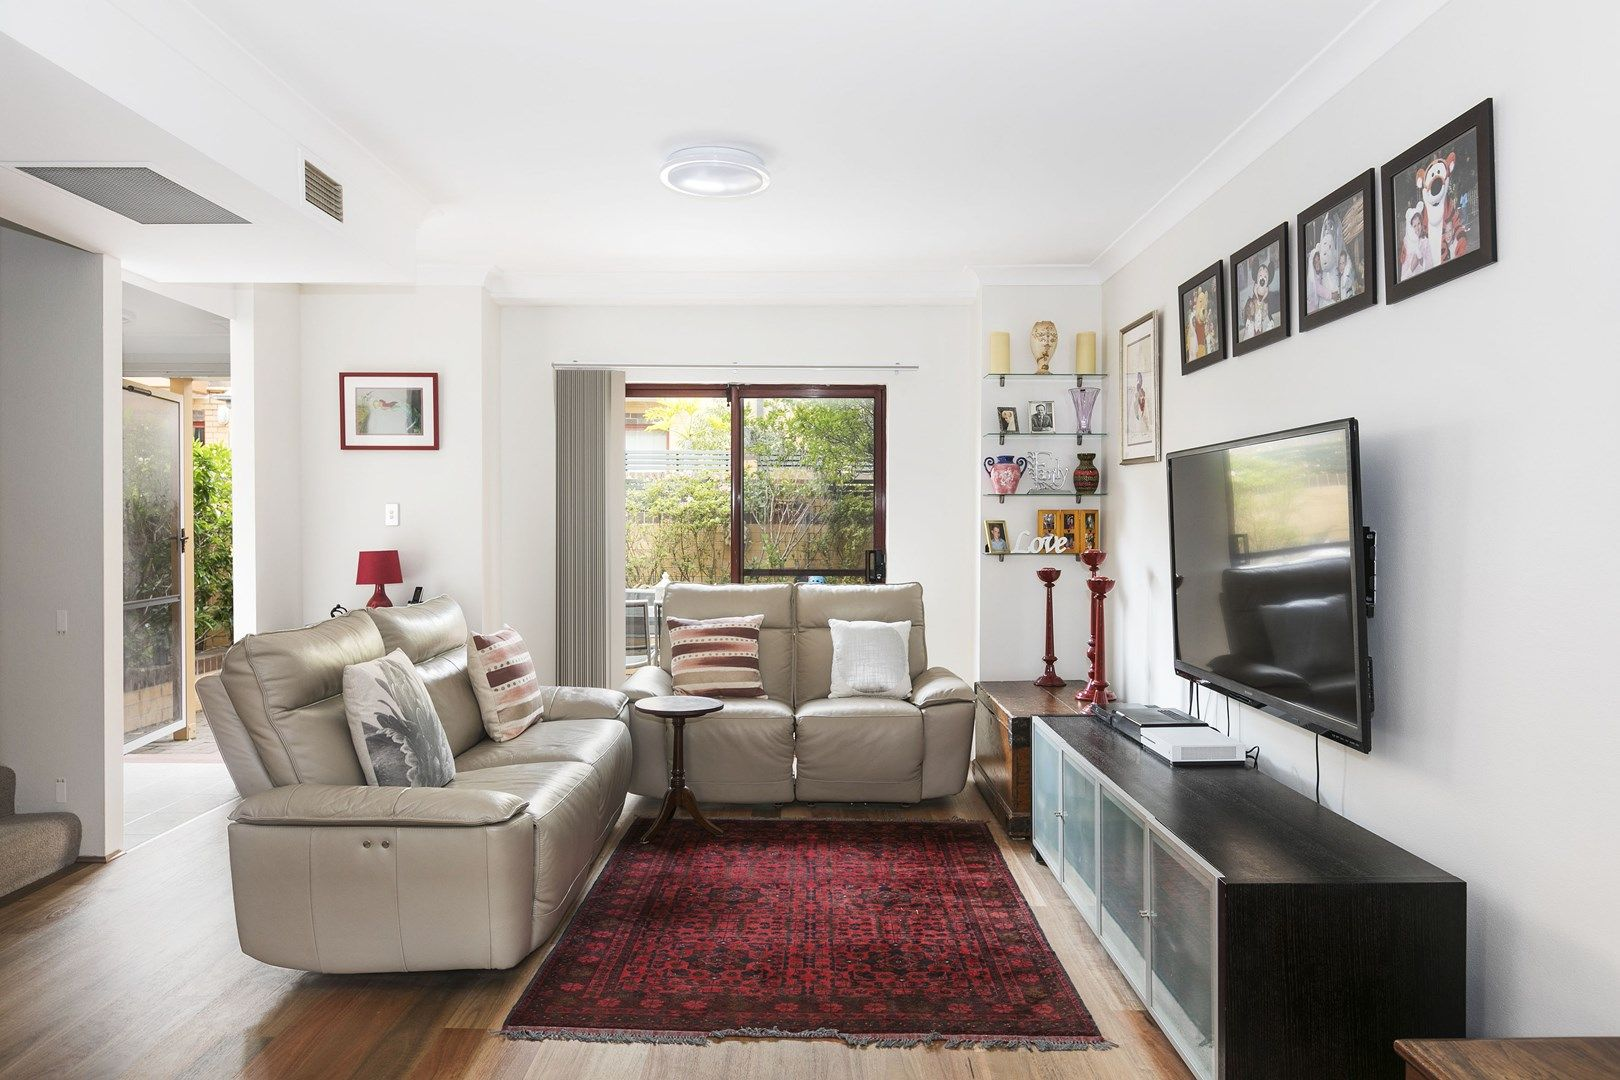 22/1 Foy Street, Balmain NSW 2041, Image 0